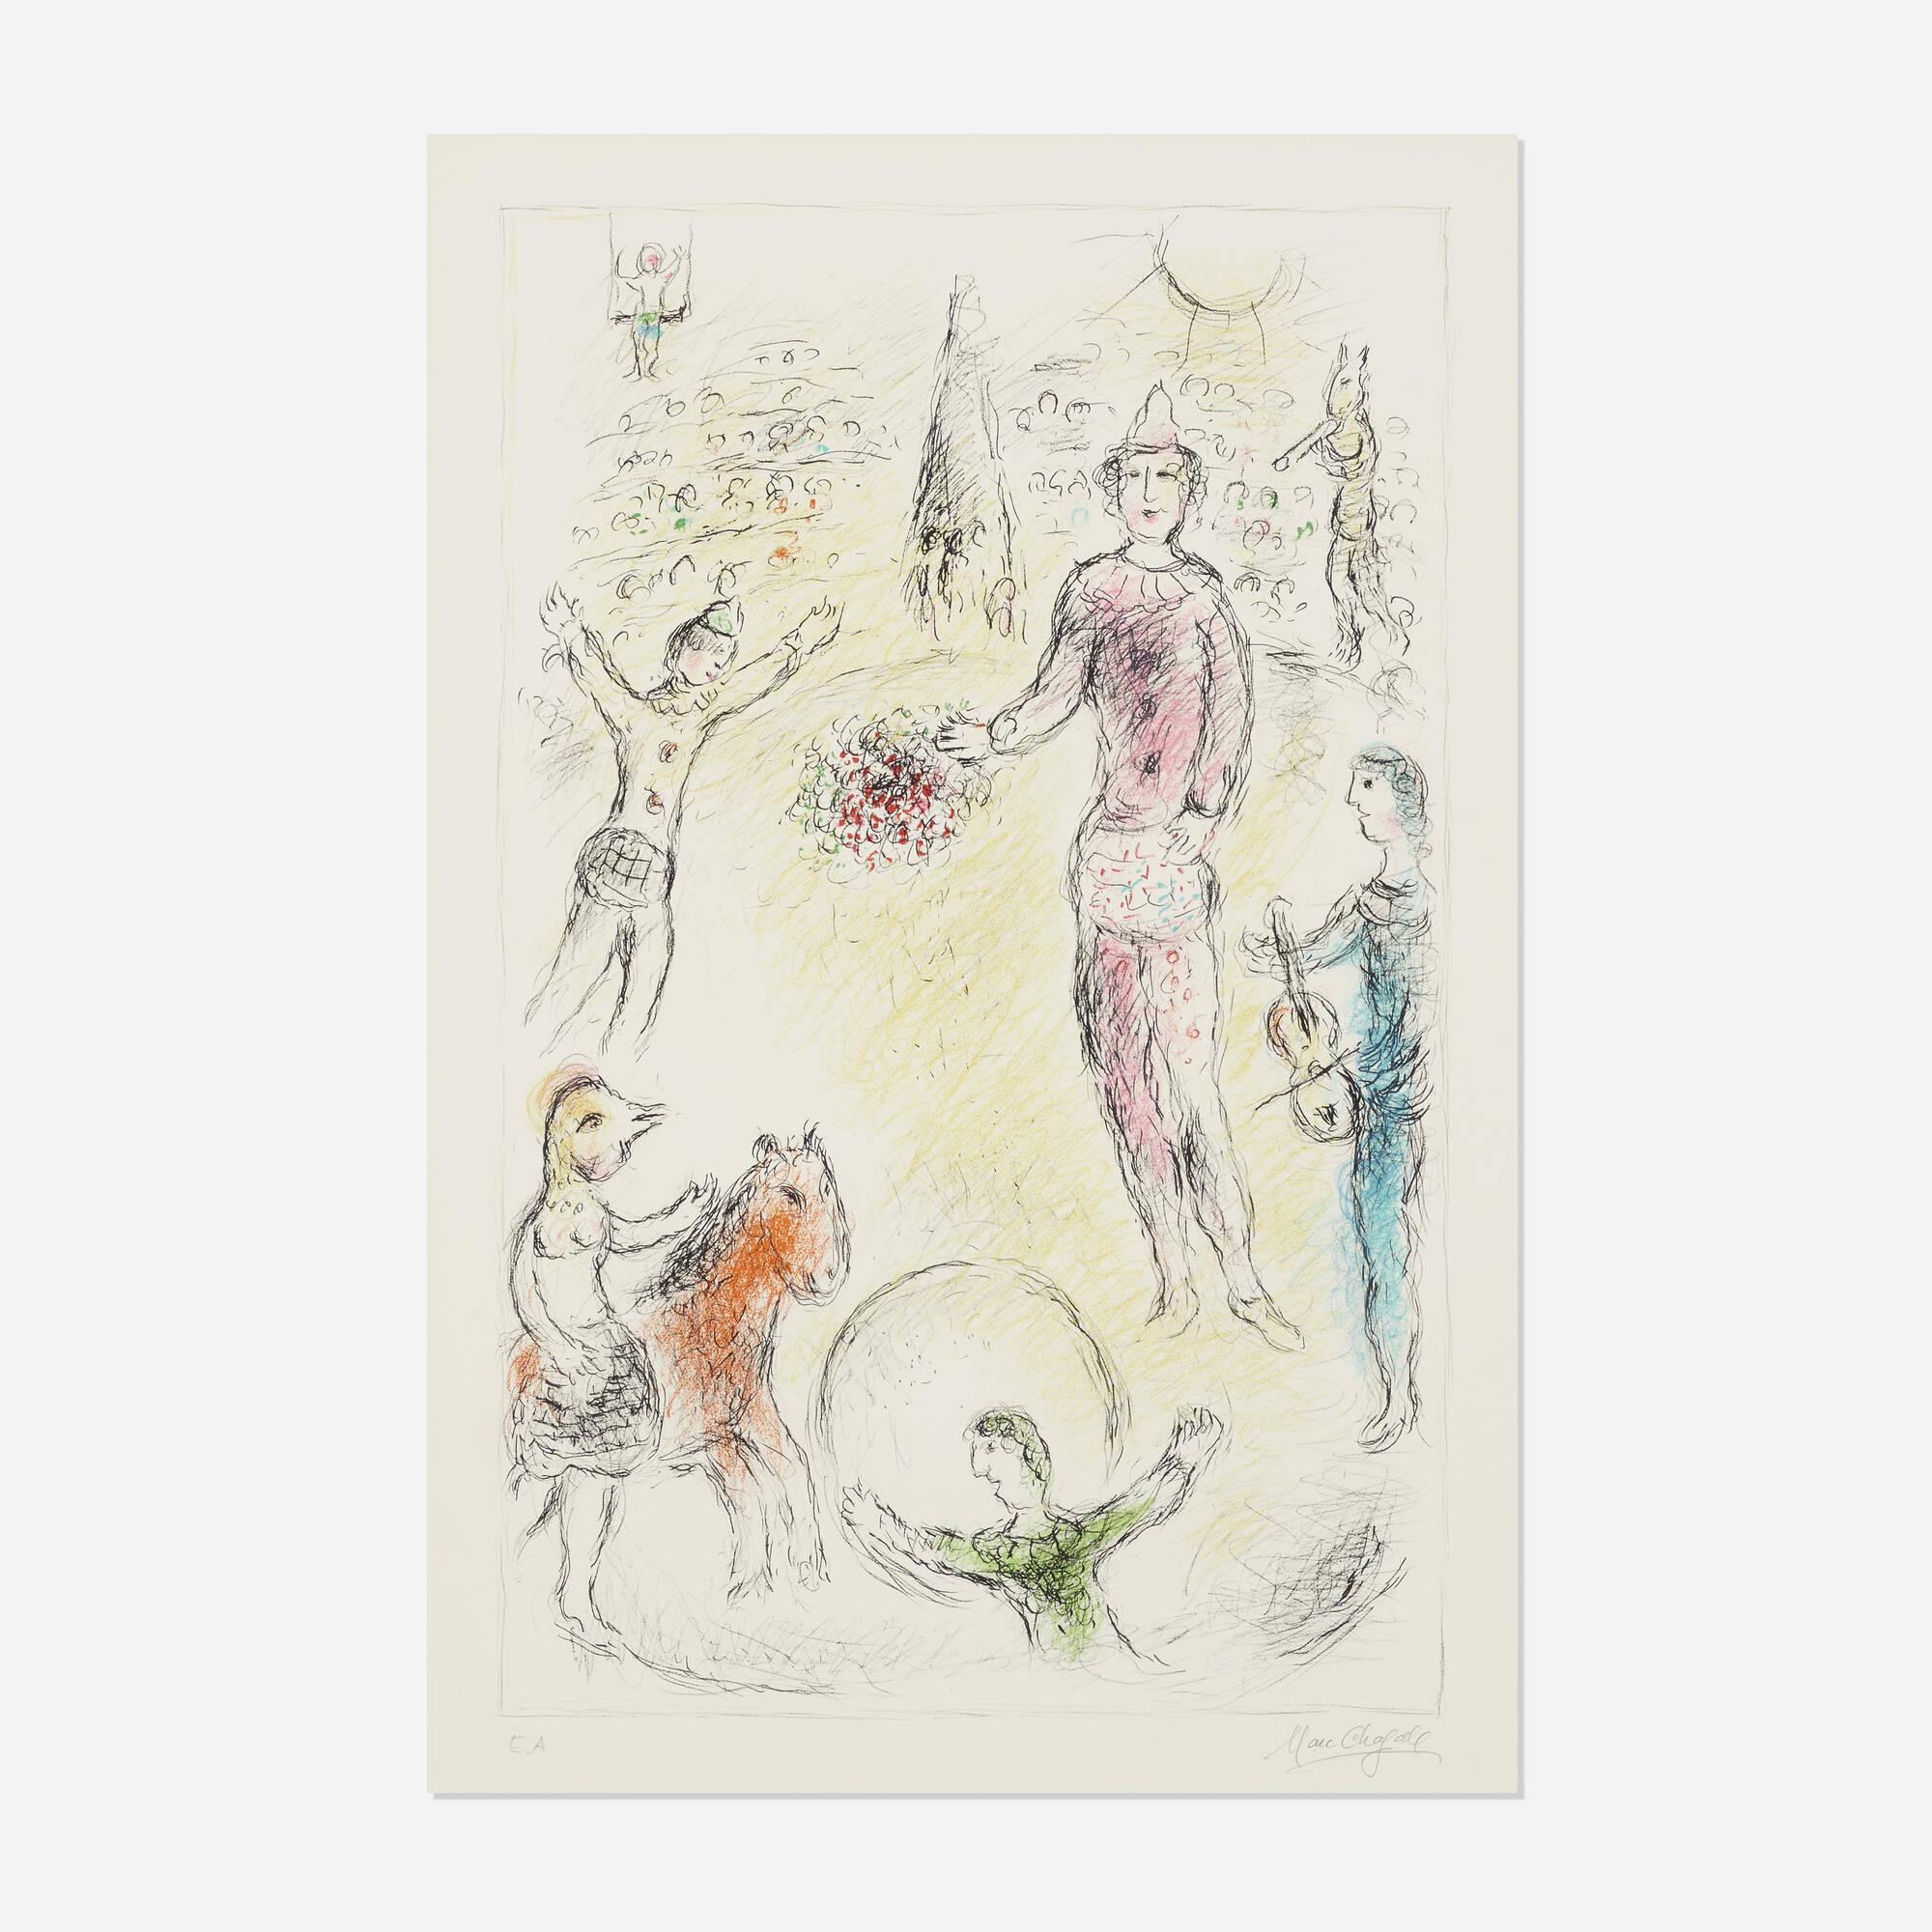 195: Marc Chagall / Musical Clowns (1 of 2)